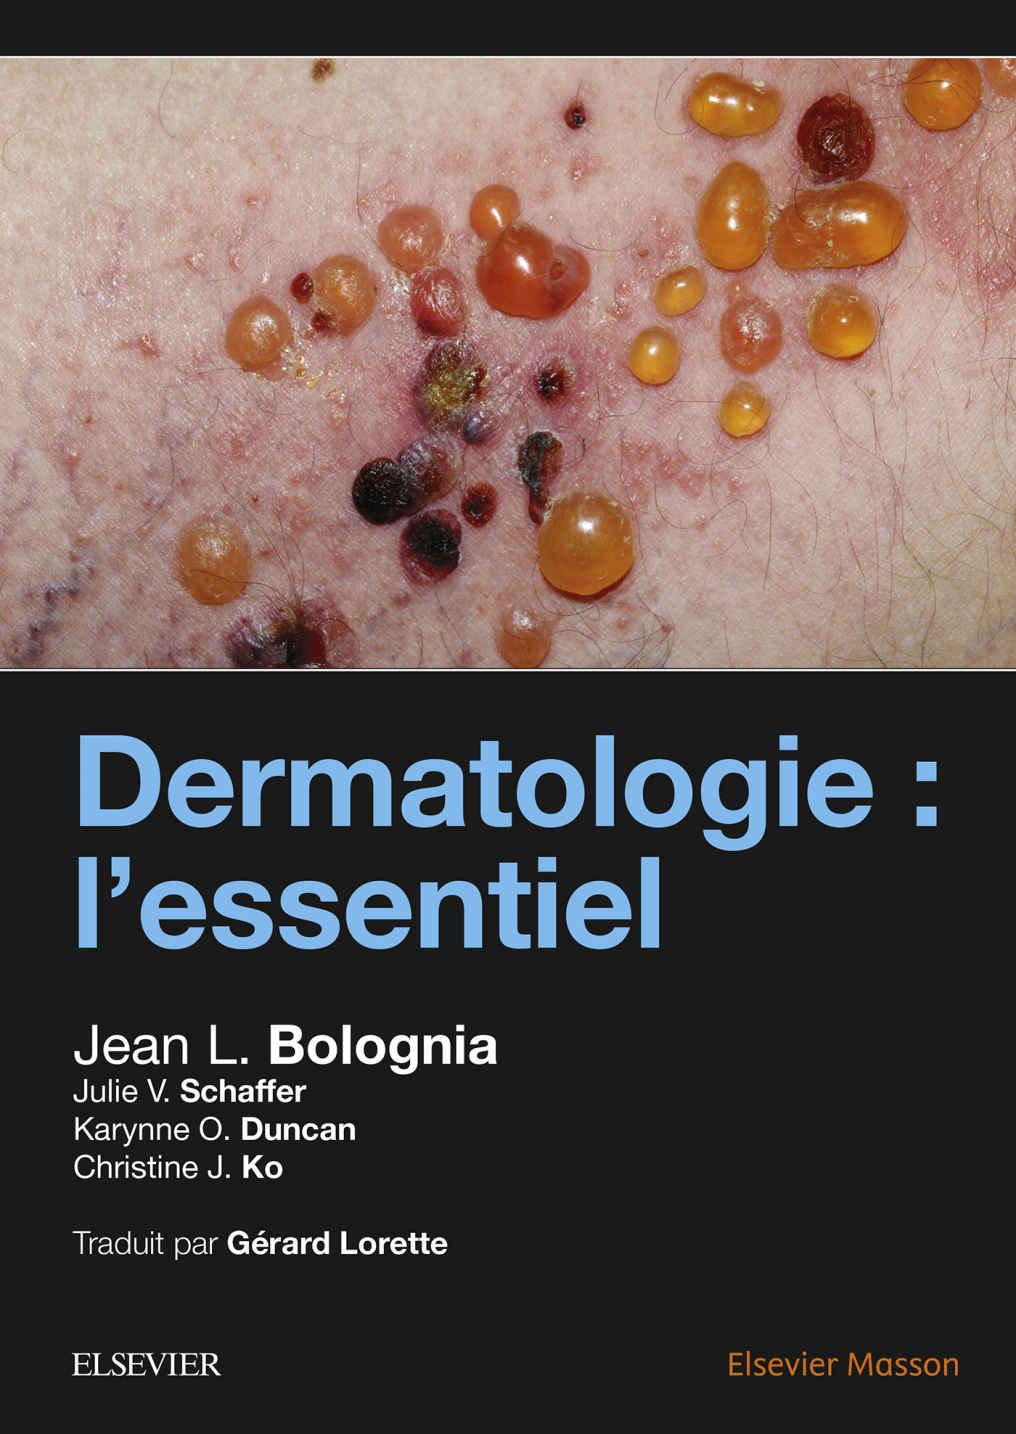 DERMATOLOGIE : L'ESSENTIEL pdf Cover